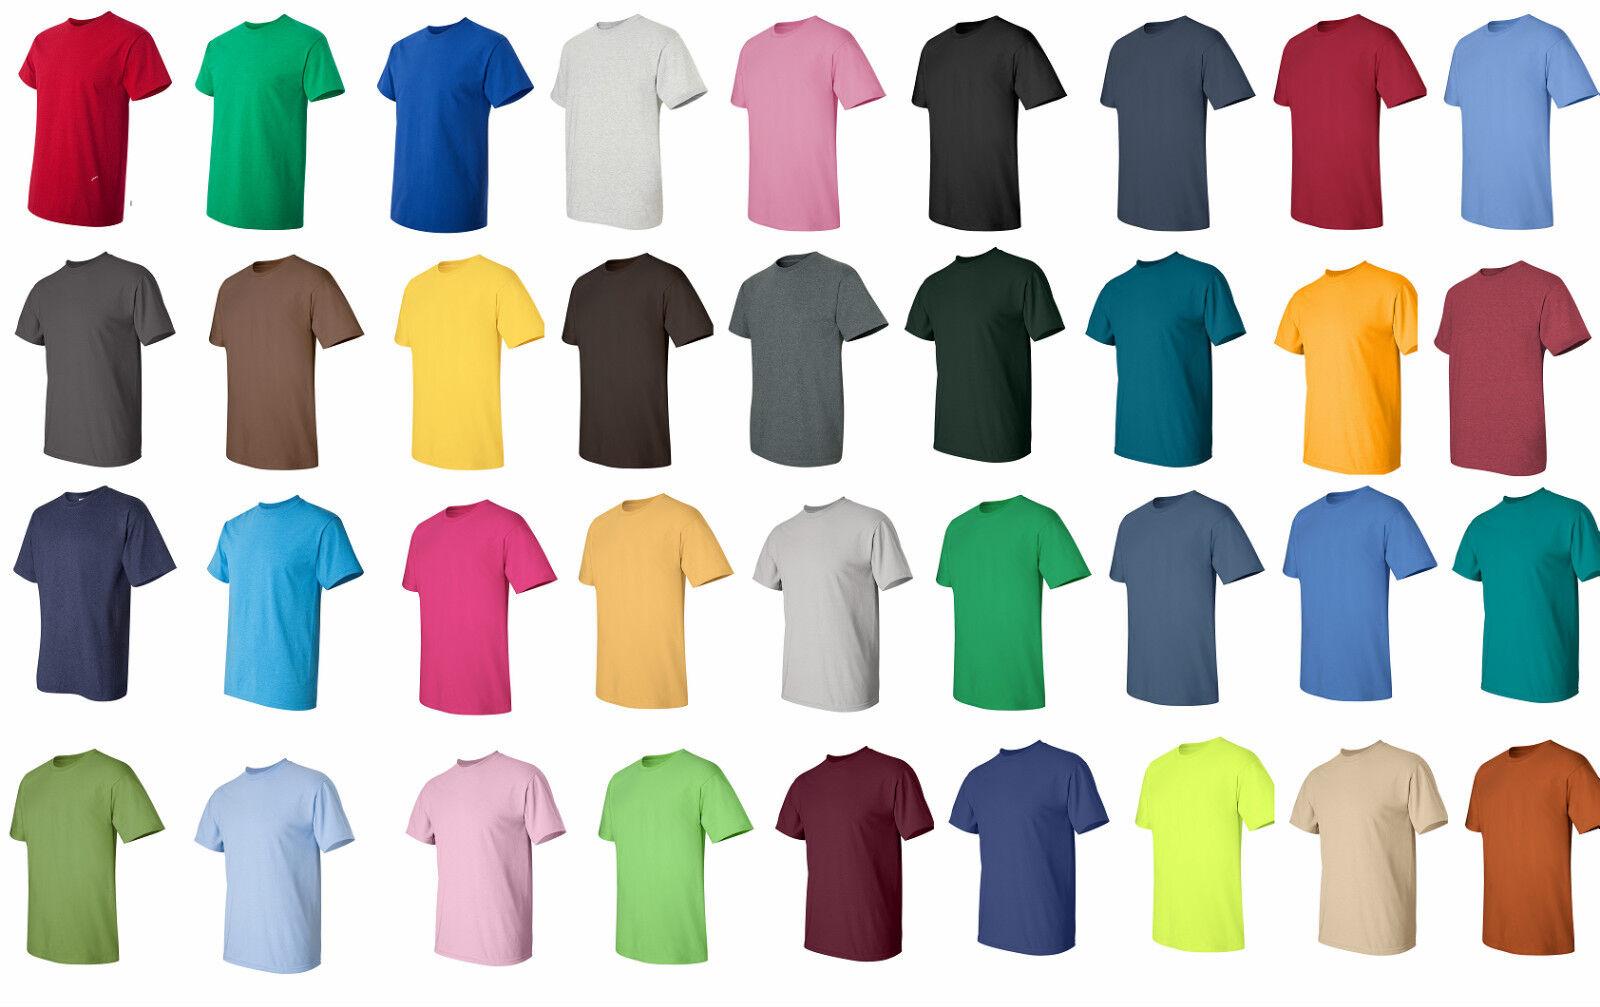 25,50 or 100 Gildan Blank T-Shirts  Bulk Wholesale S-XL Weiß or Farbes, 2000